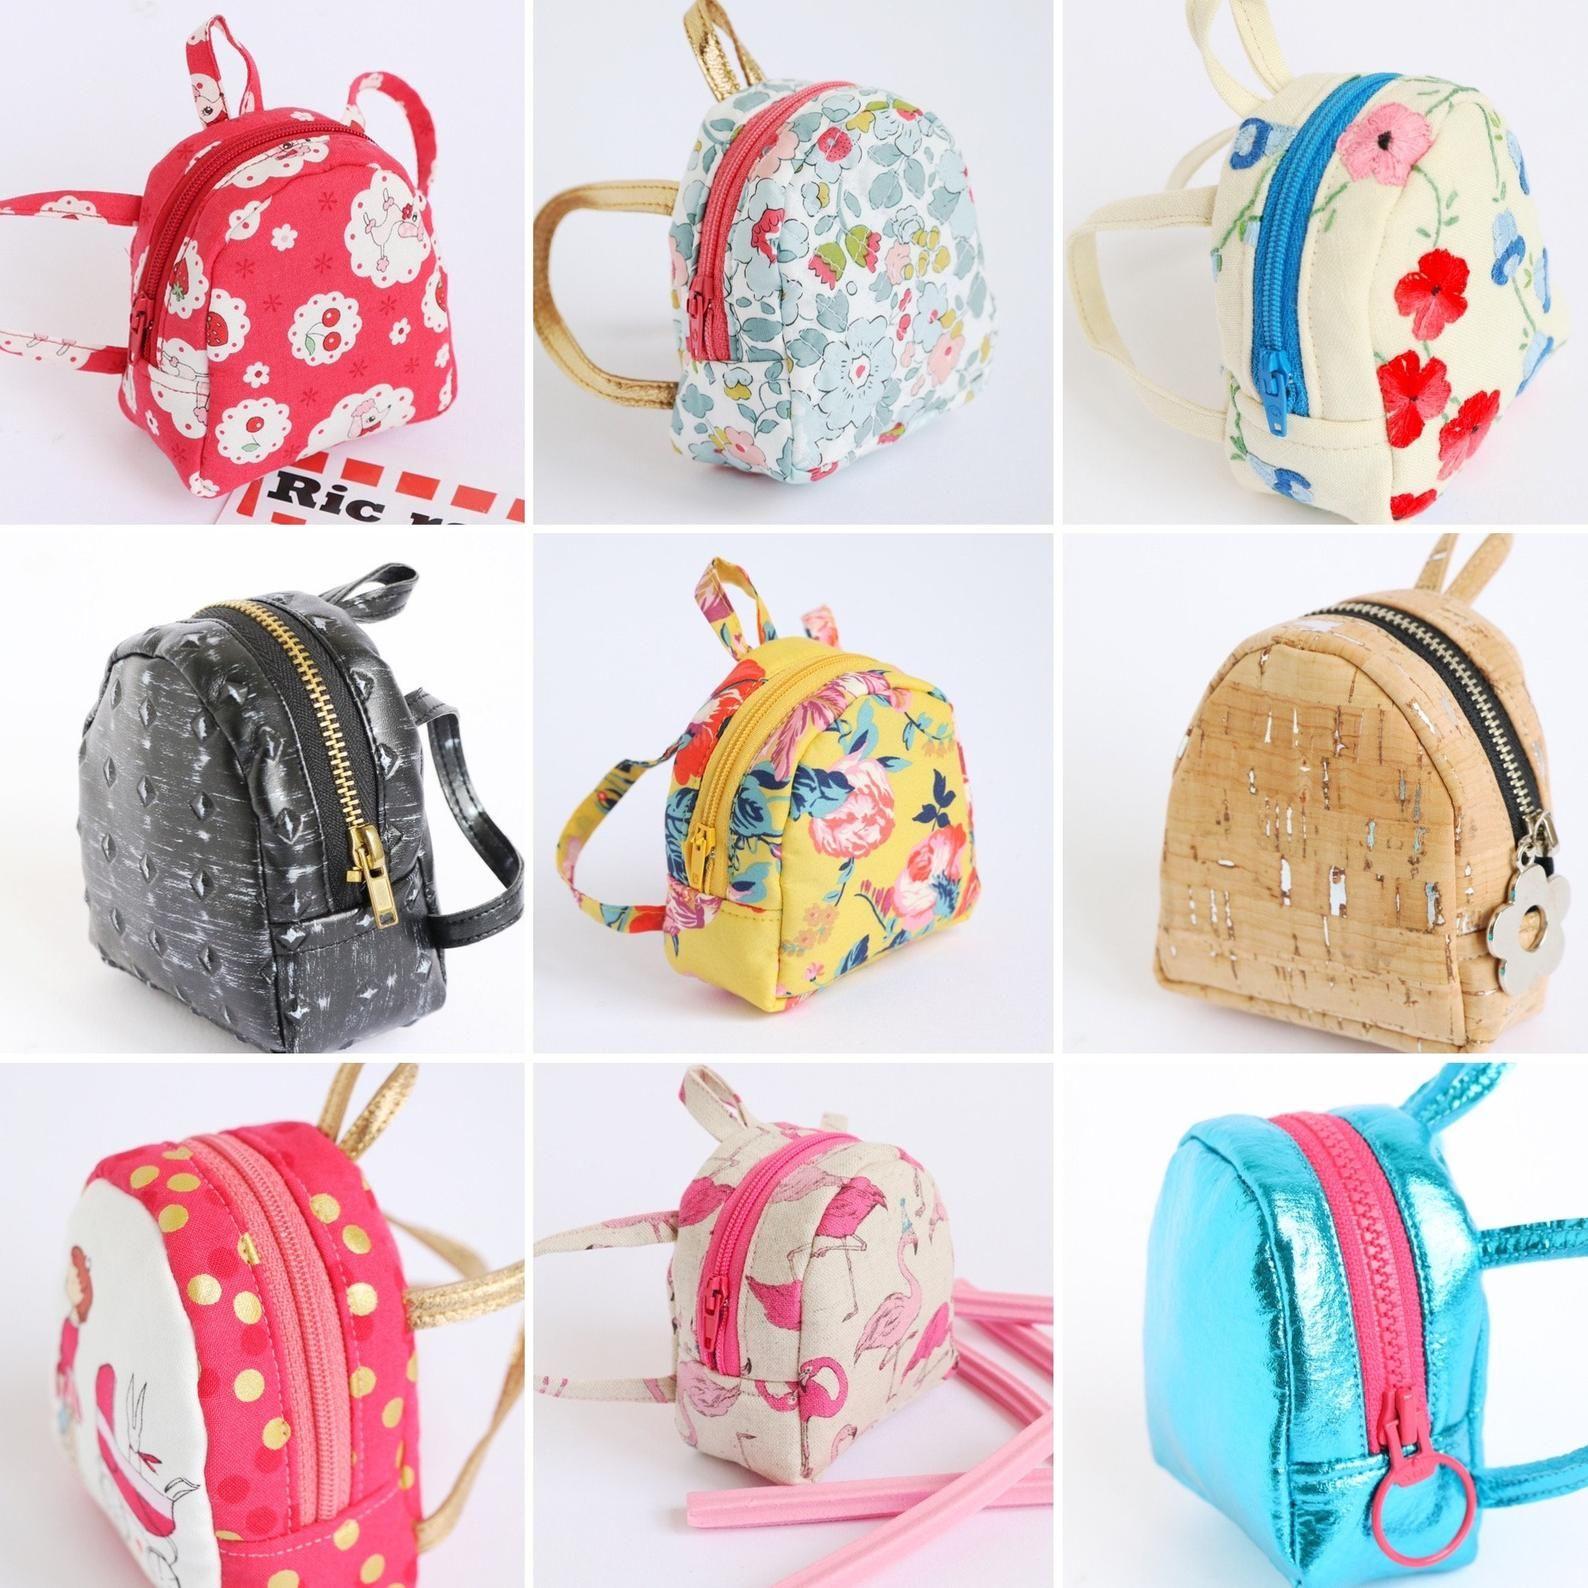 Doll Backpack Mini Backpack Pattern Digital Download Backpack